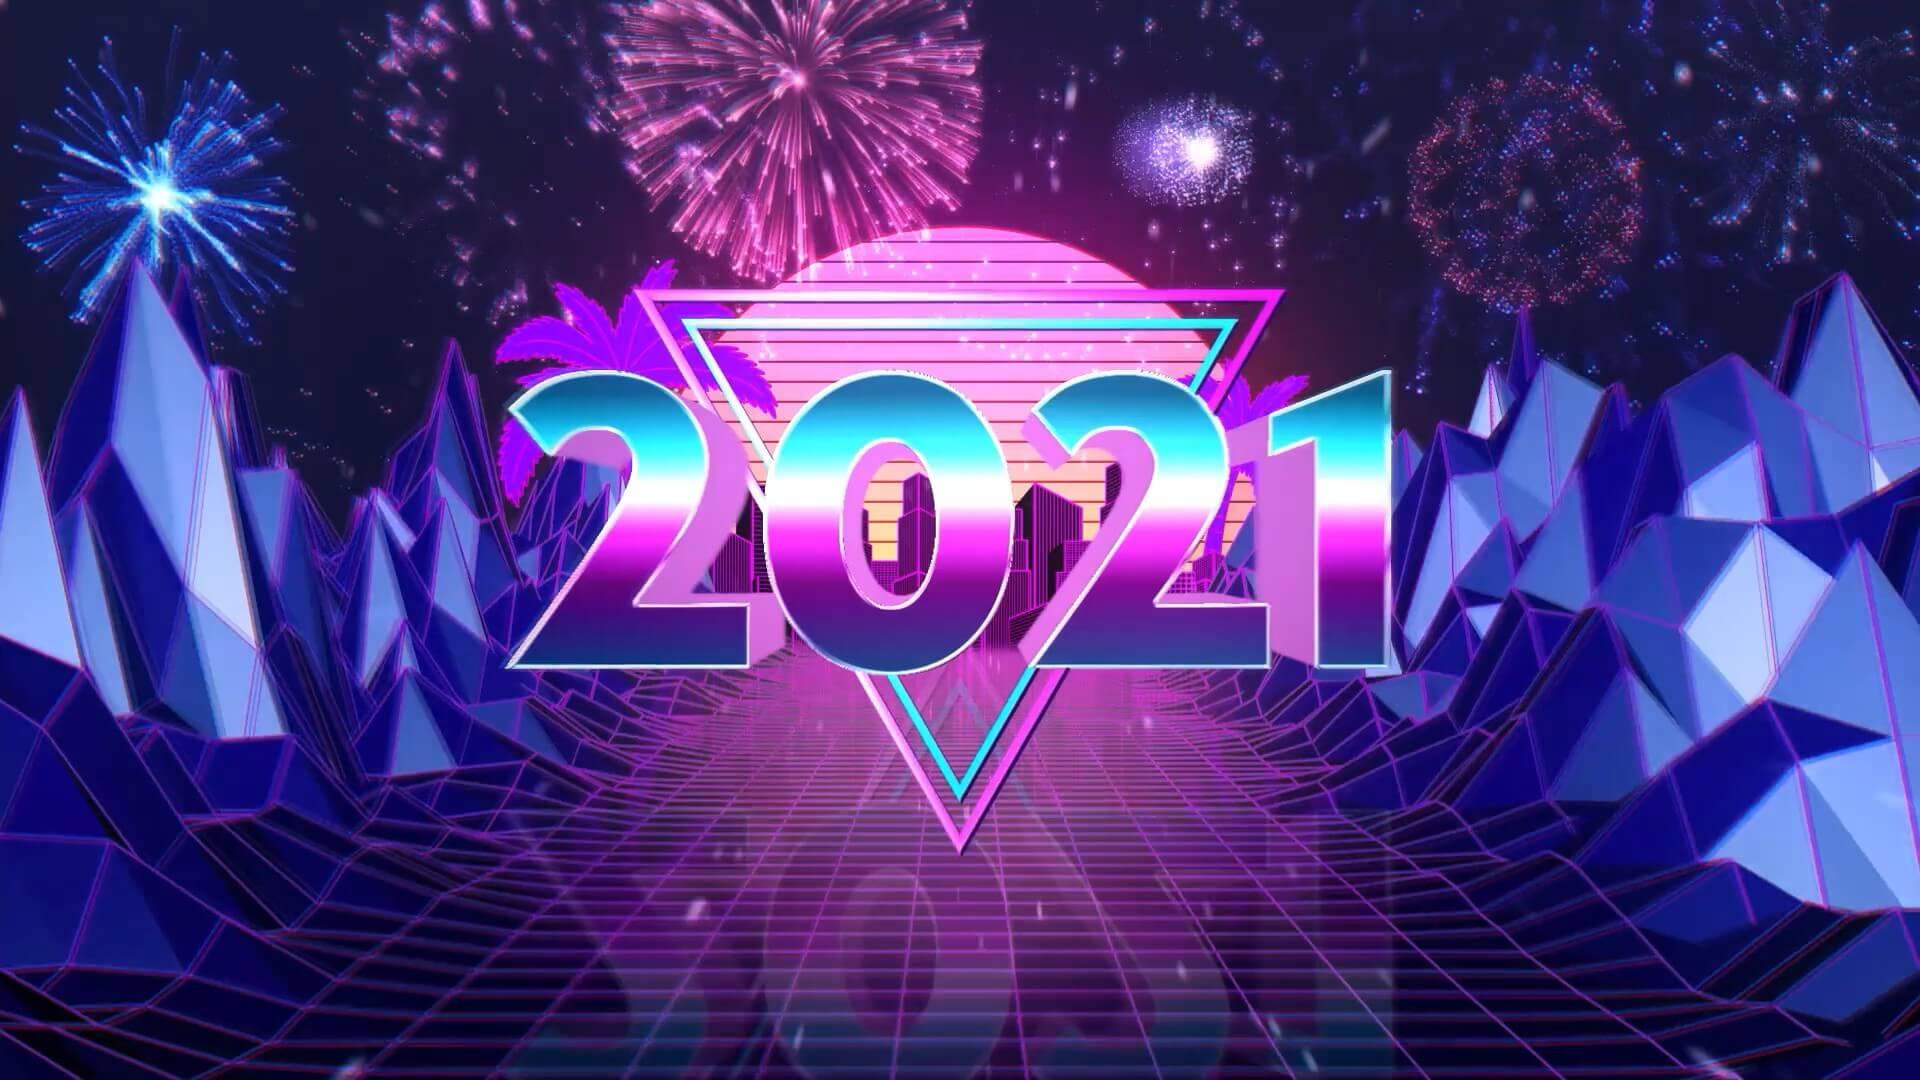 AE模板 2021年赛博朋克风格新年倒计时片头模板 New Year Countdown